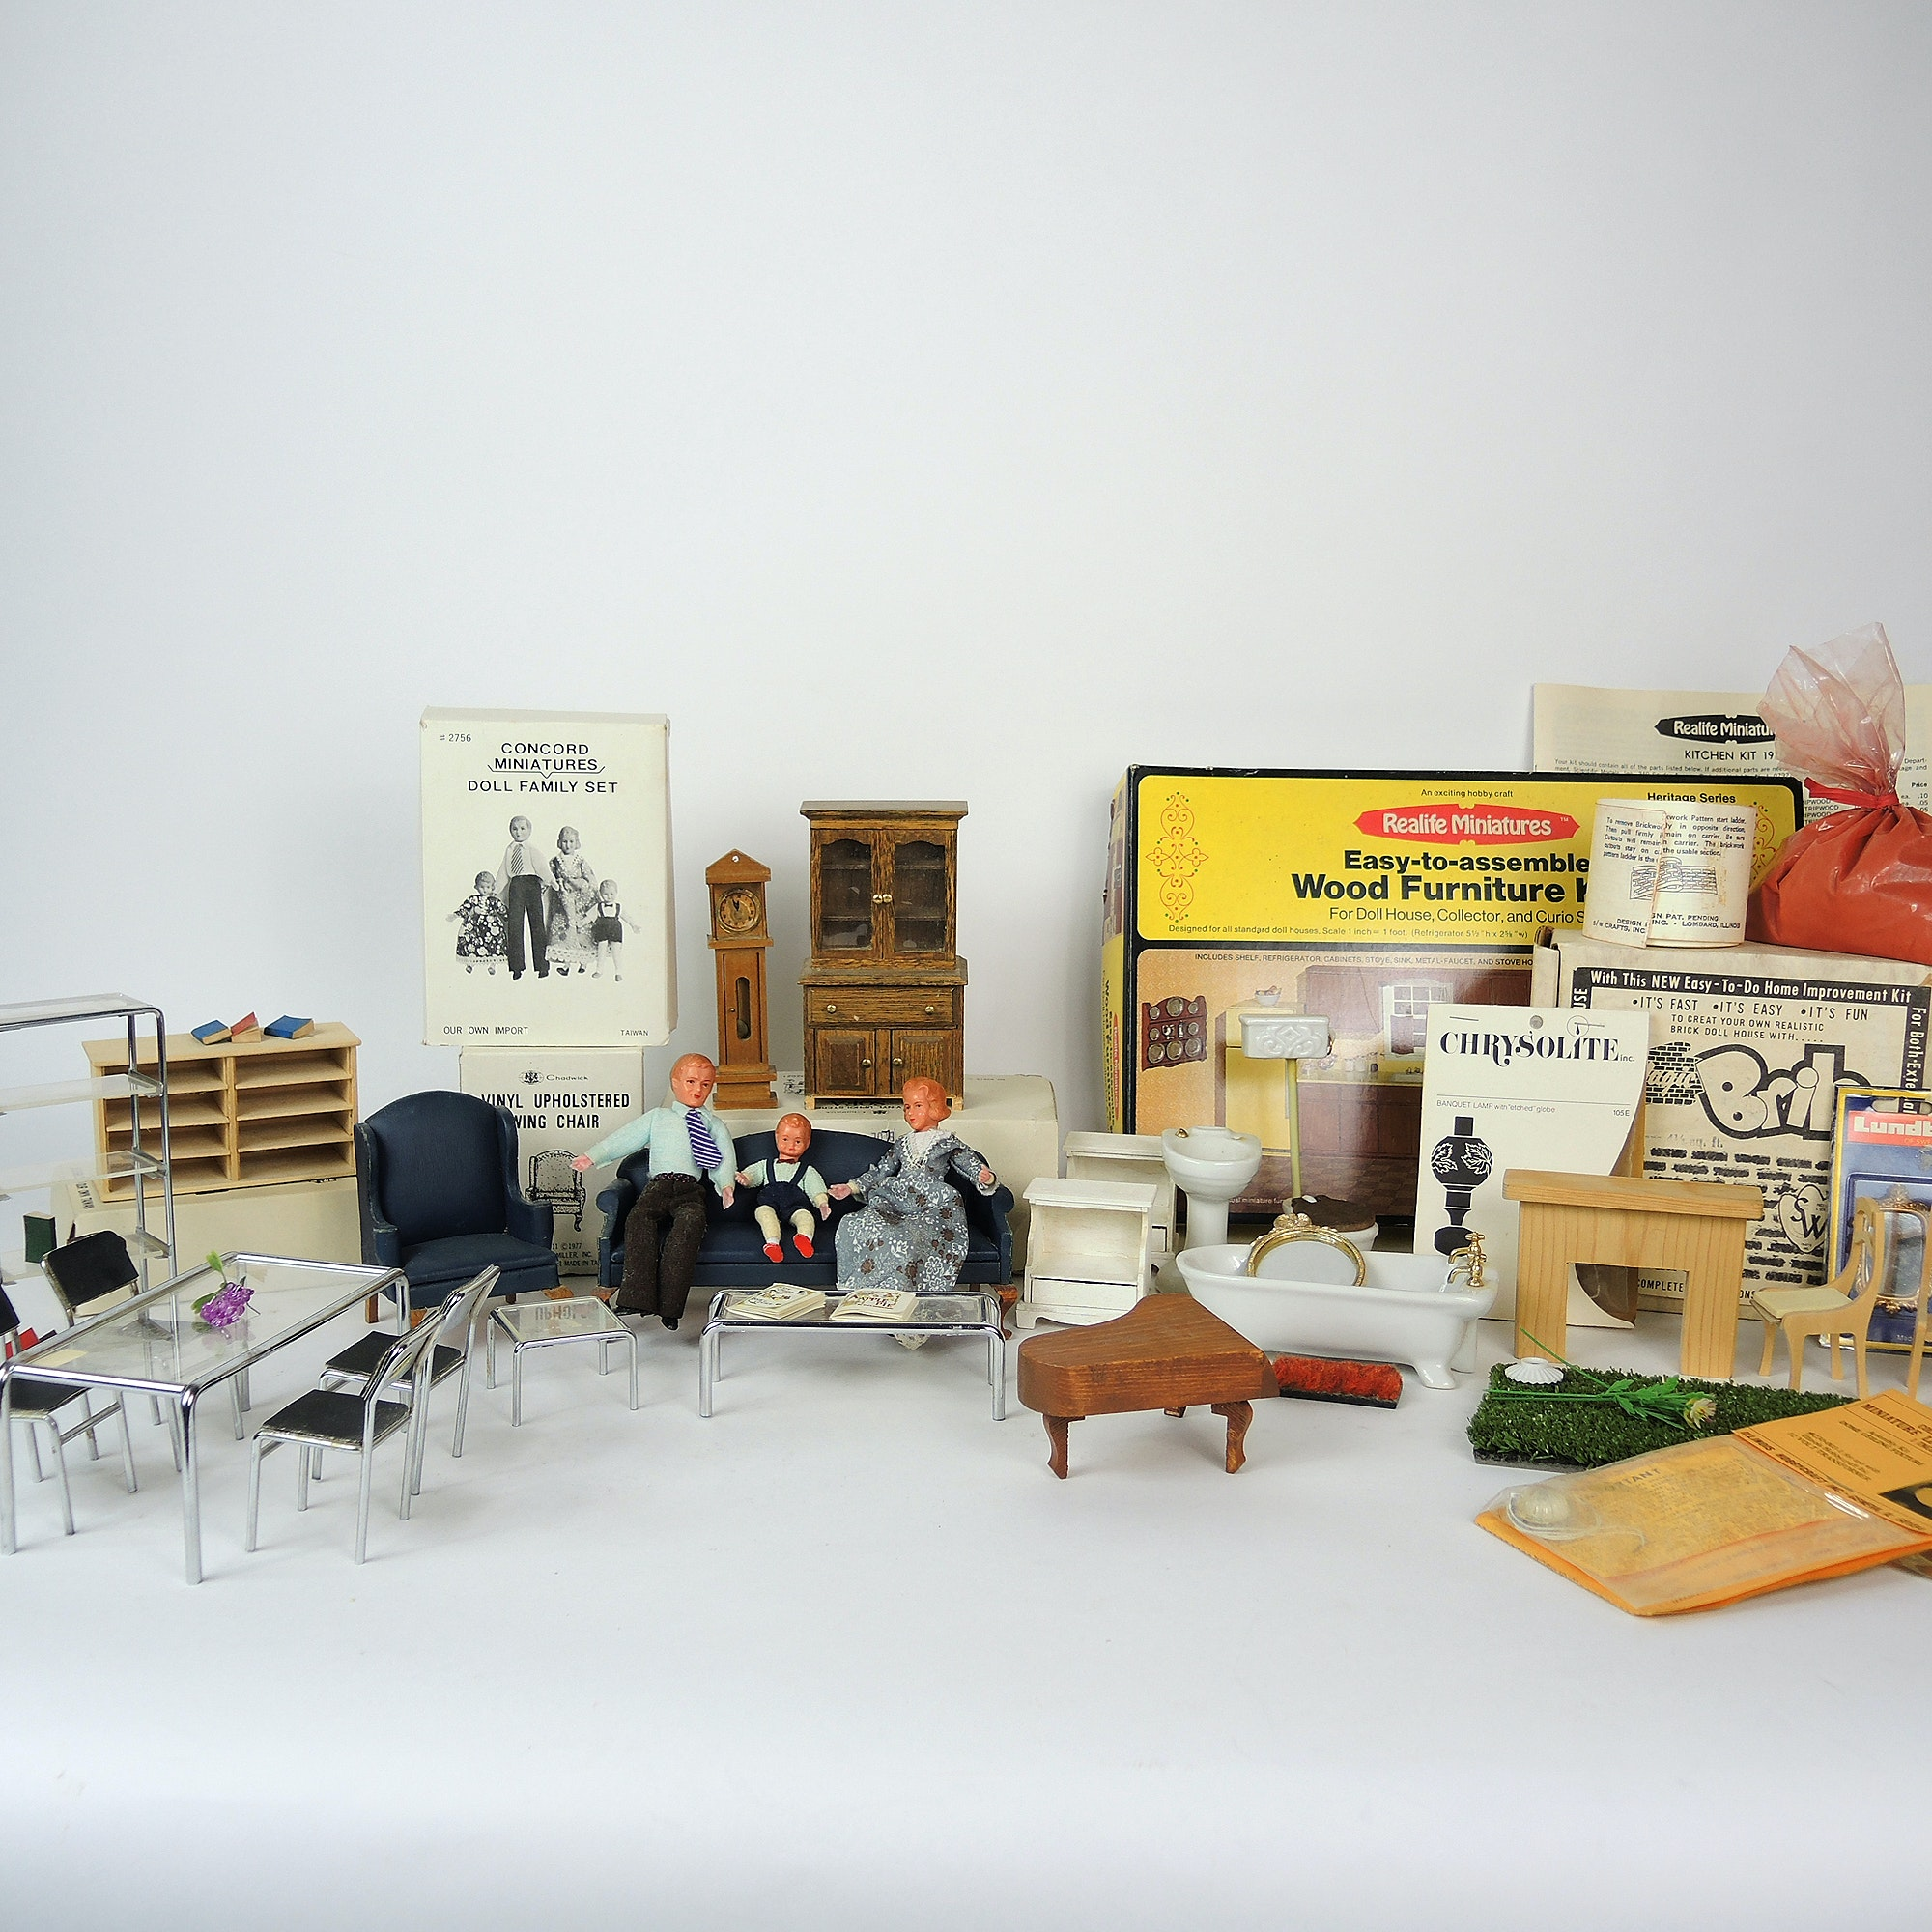 Vintage Dollhouse Miniatures And Wood Furniture Kits Ebth